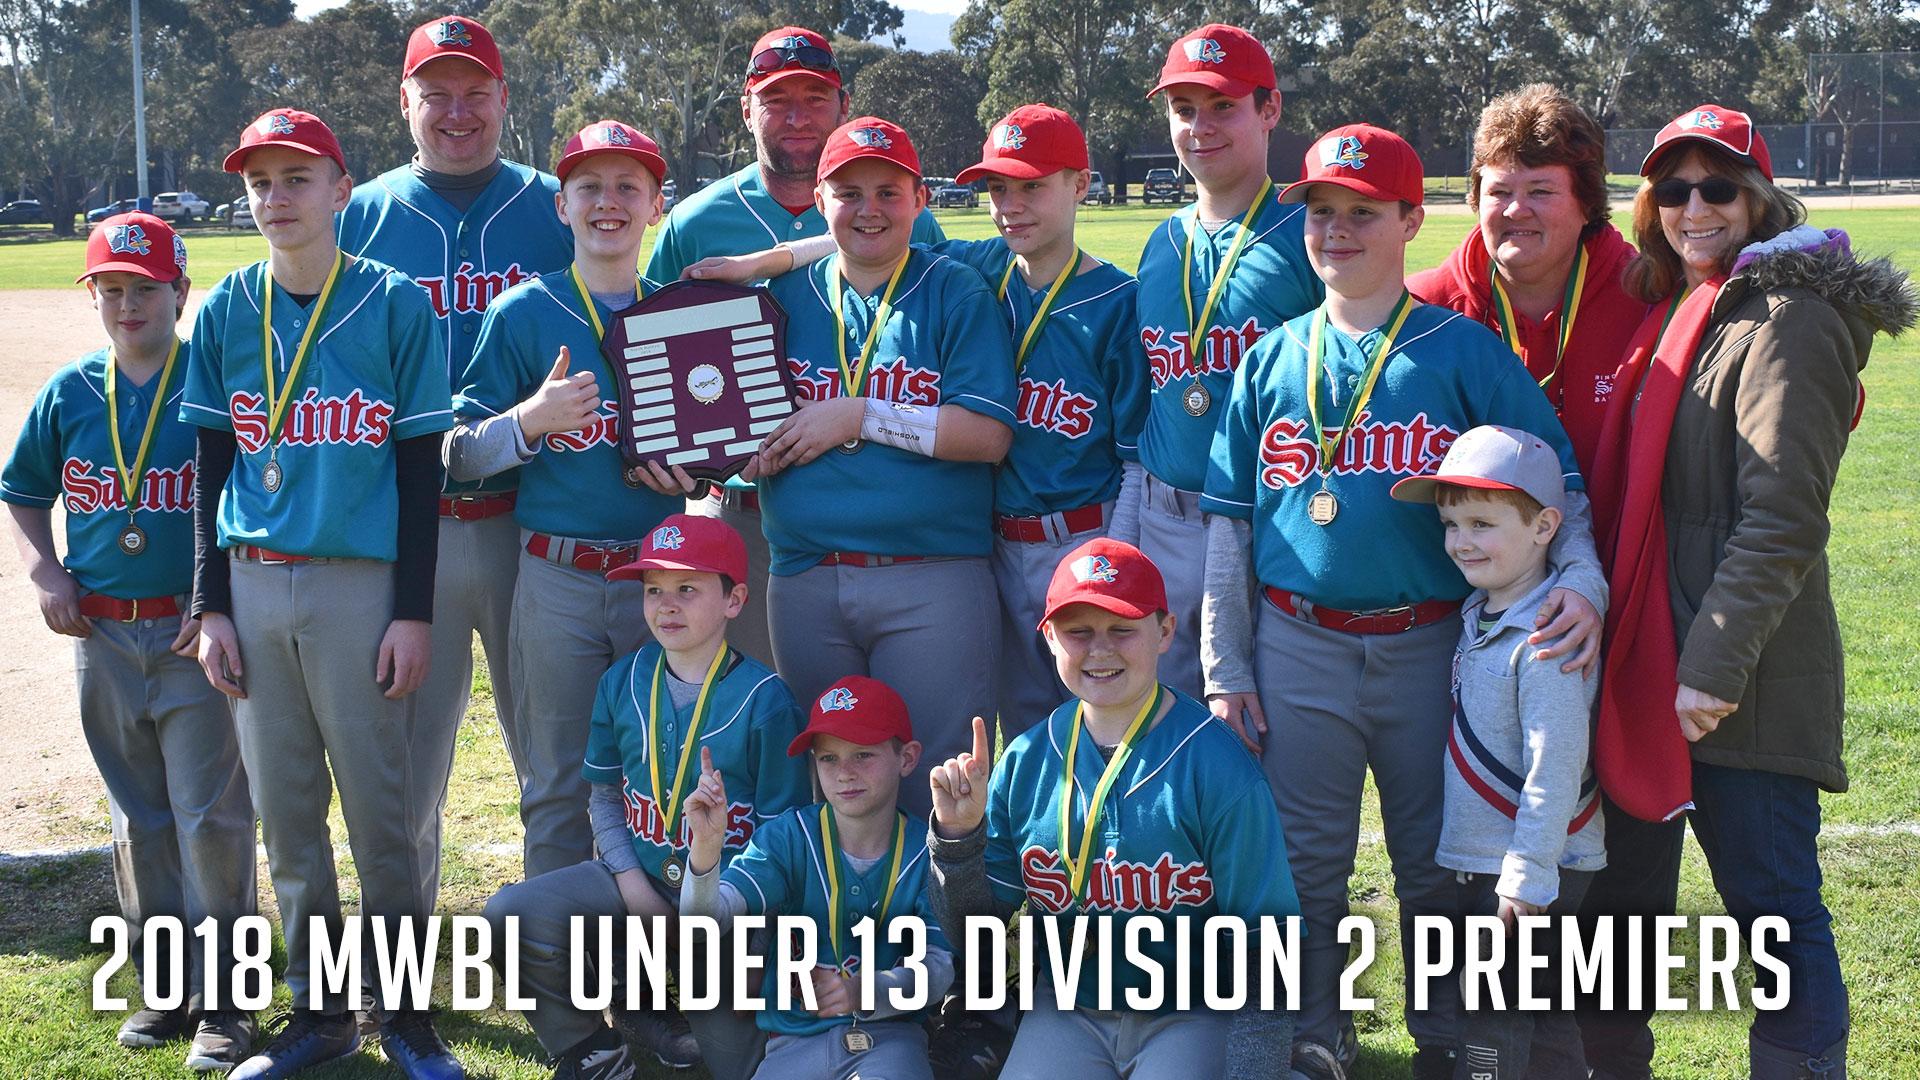 U13 Division 2 Premiers